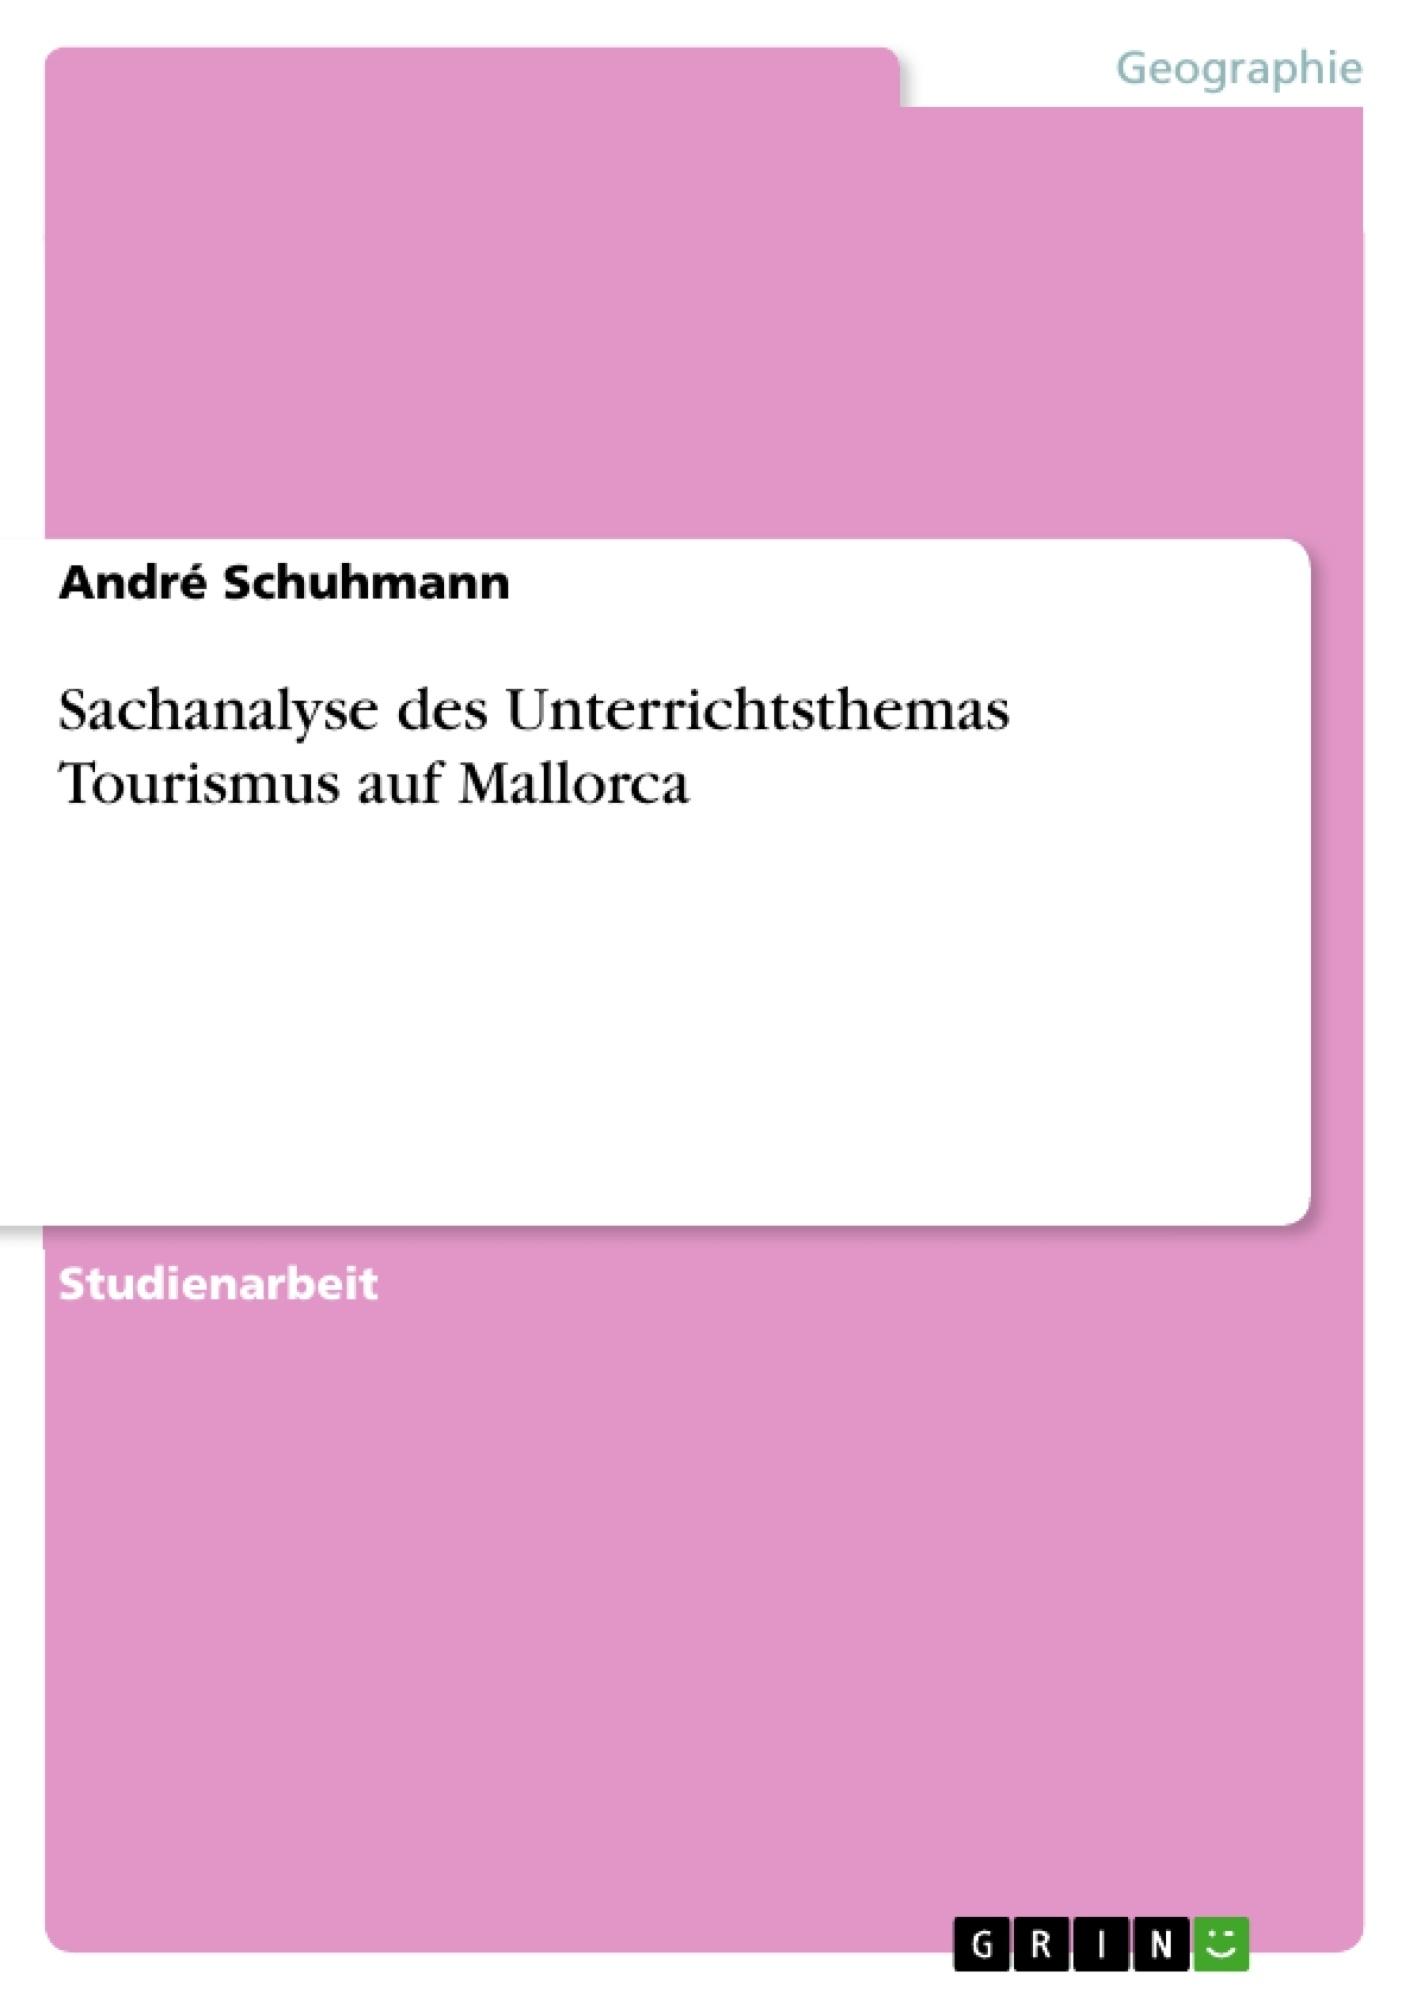 Titel: Sachanalyse des Unterrichtsthemas Tourismus auf Mallorca